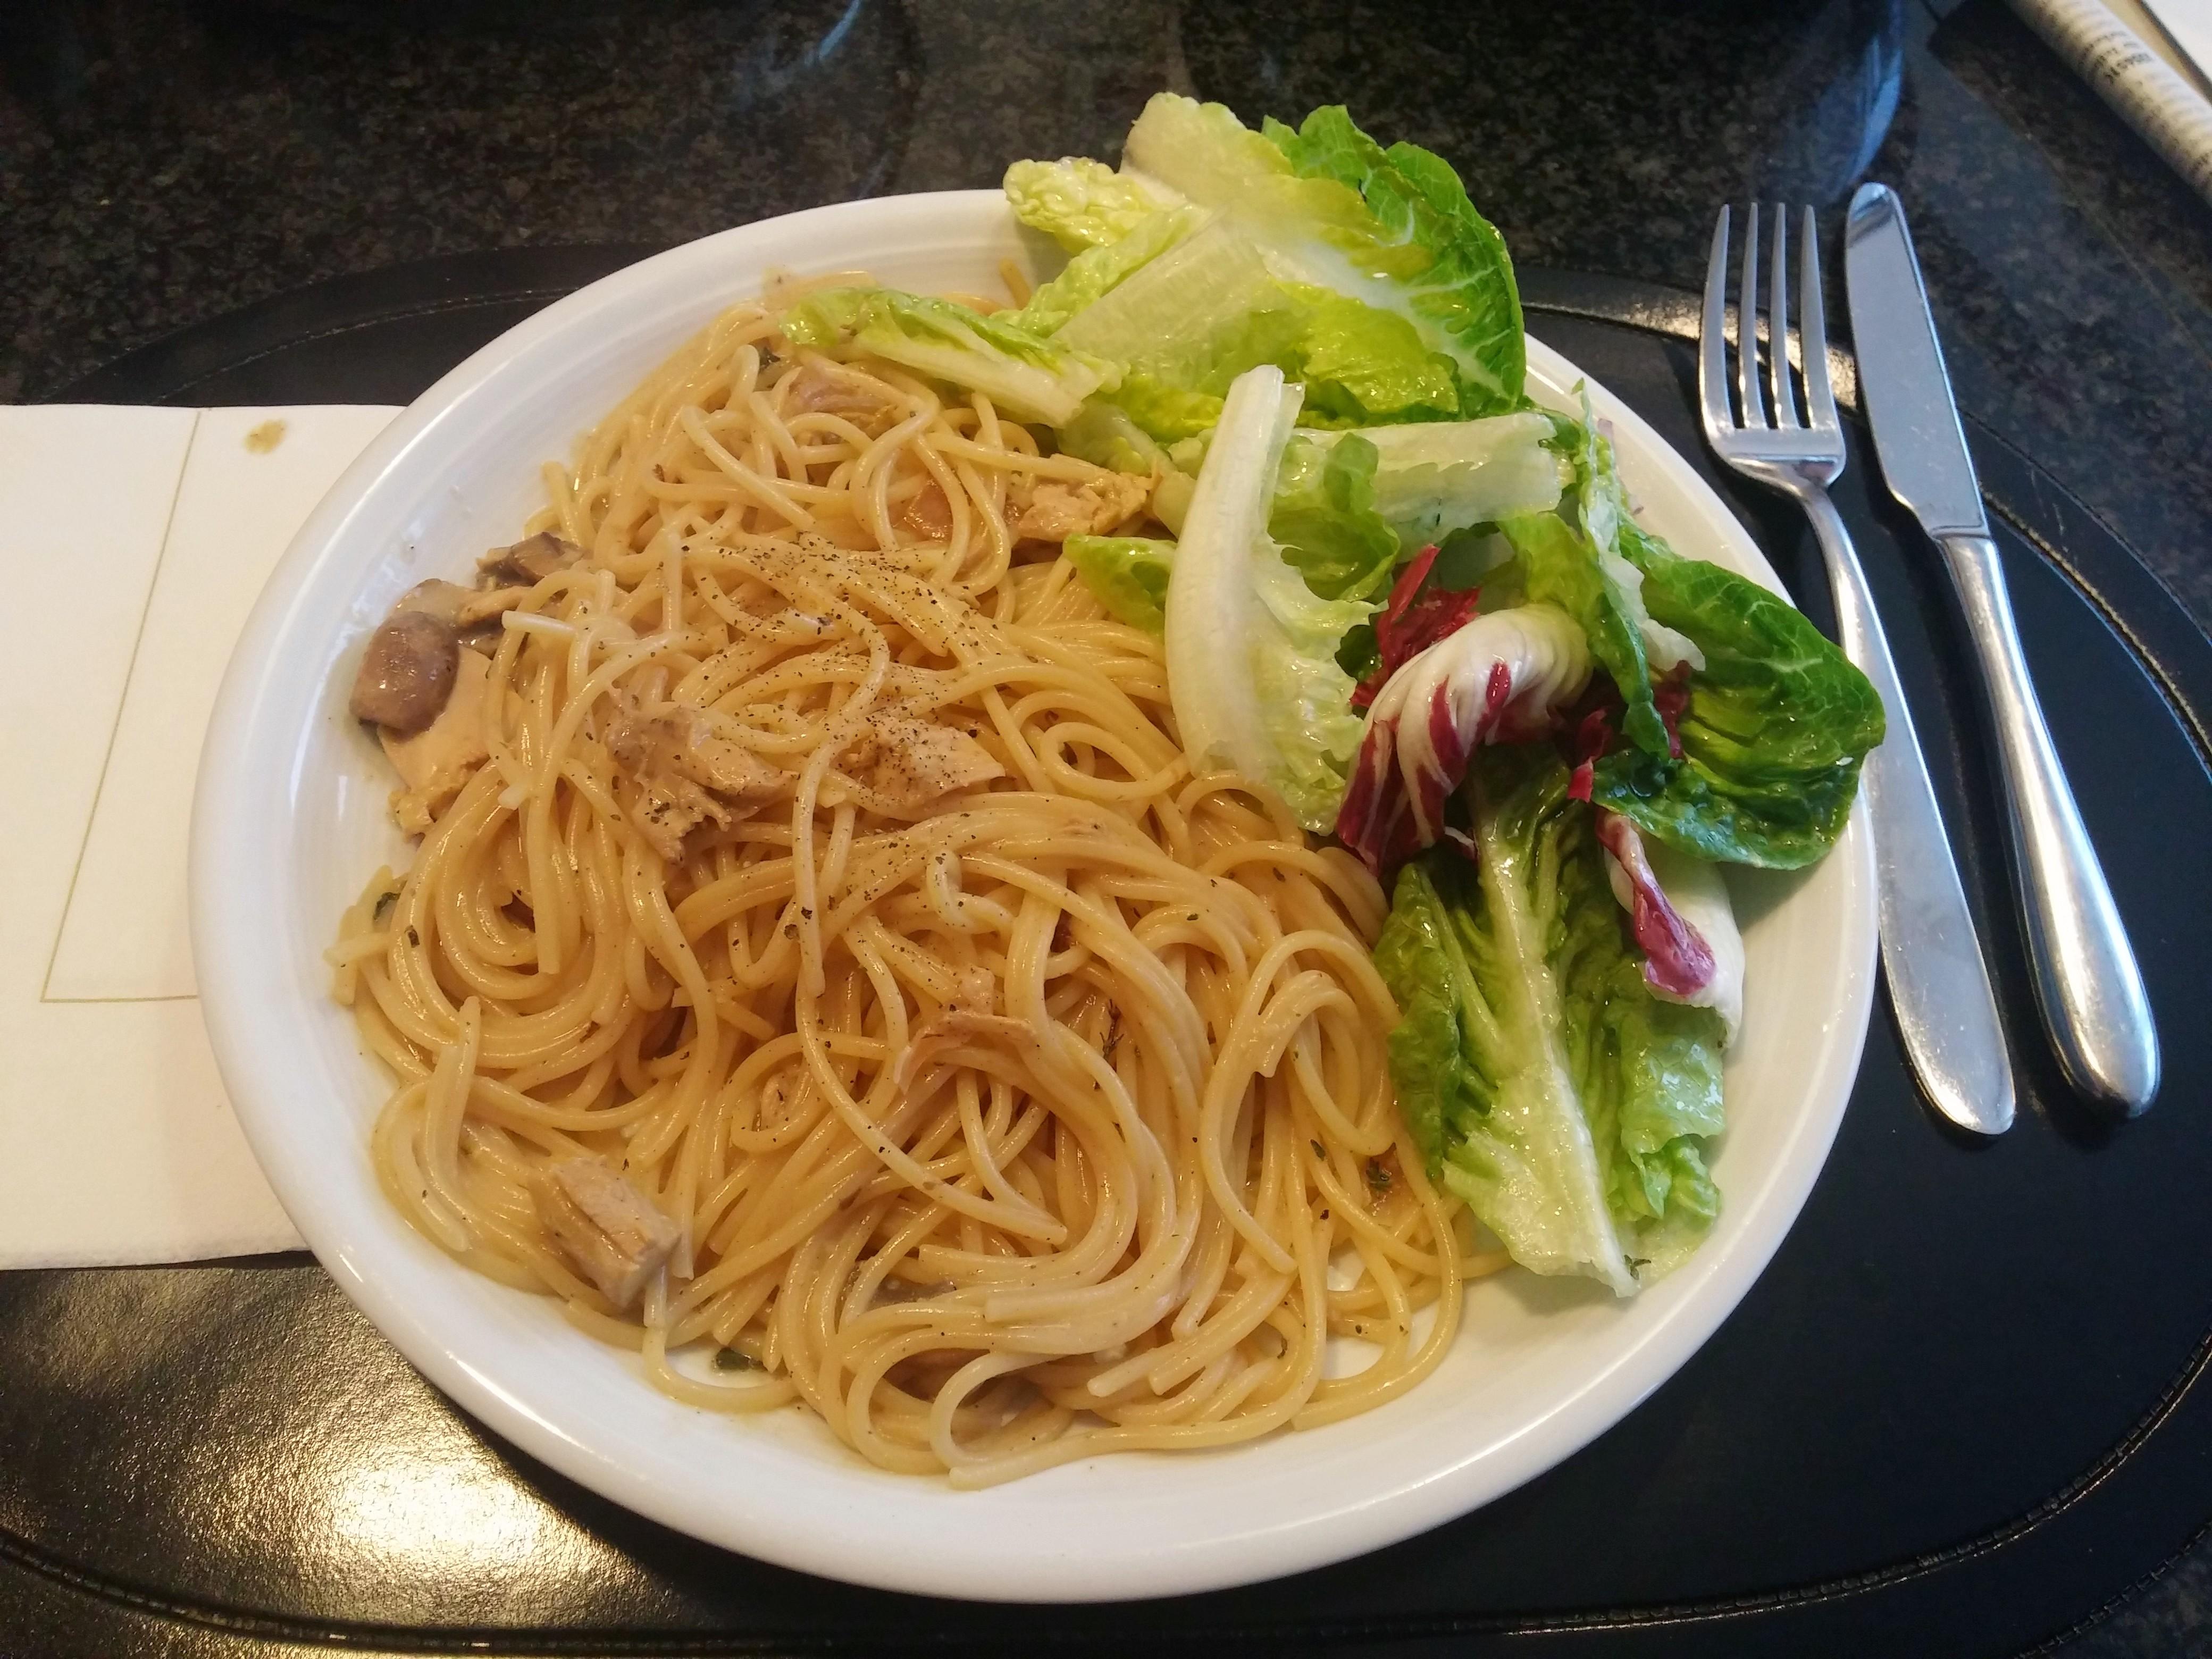 http://foodloader.net/nico_2015-02-01_spaghetti-mit-maishaehnchen-zitronen-sahne-sauce.jpg